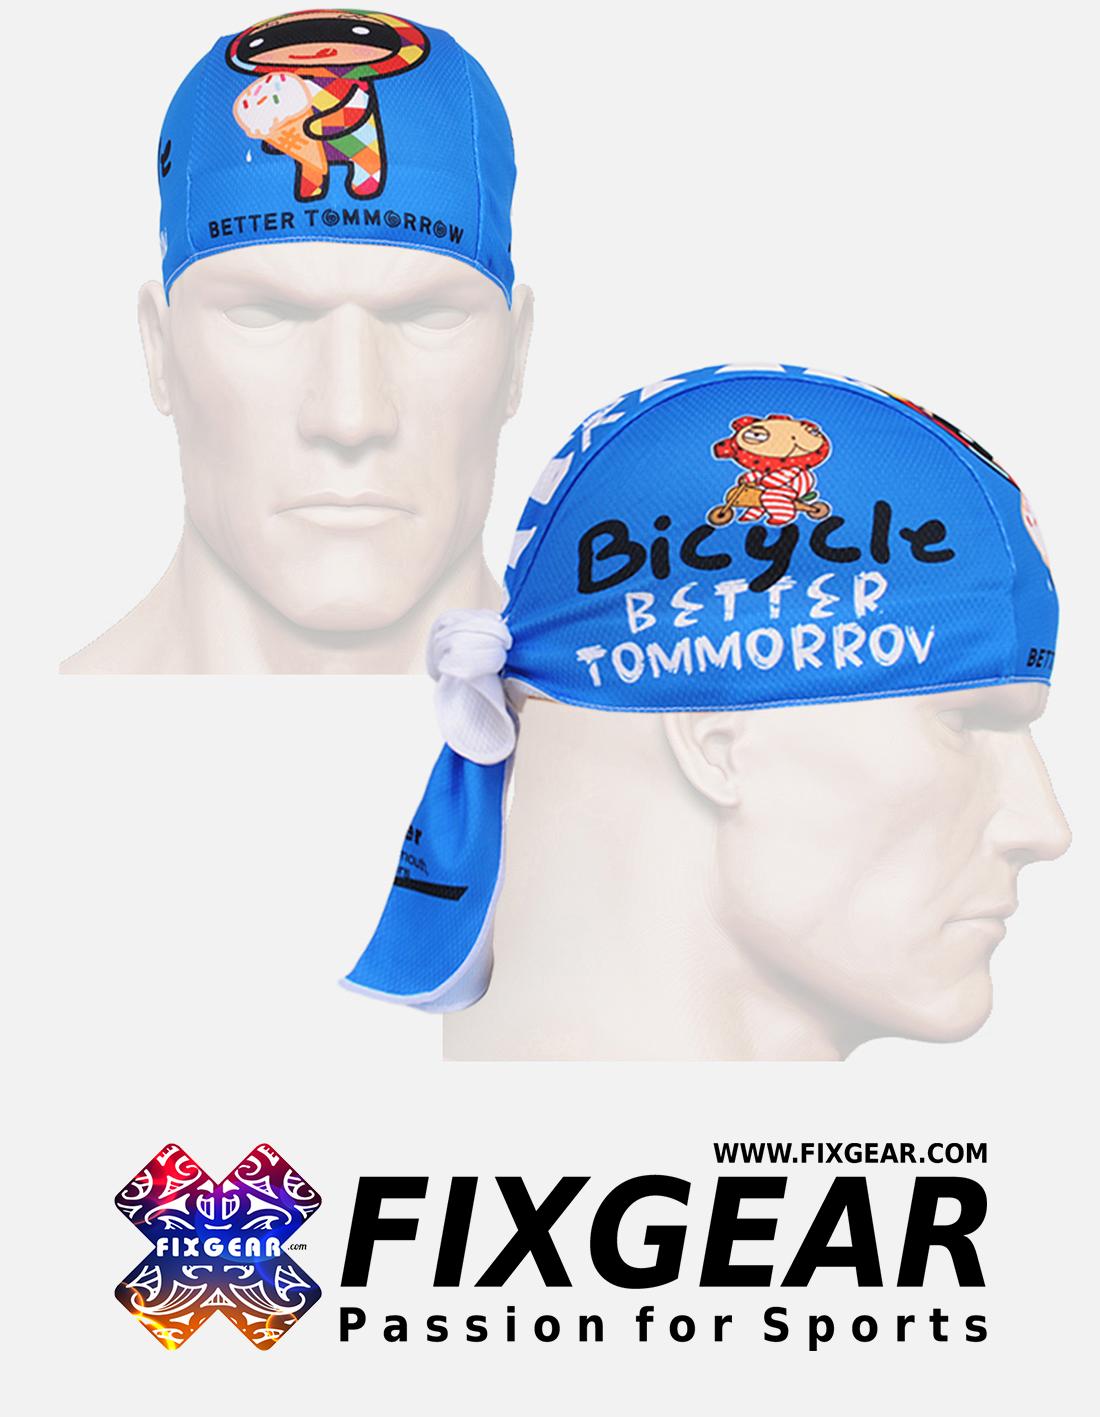 FIXGEAR D-31B Cycling Skull cap, Bandana